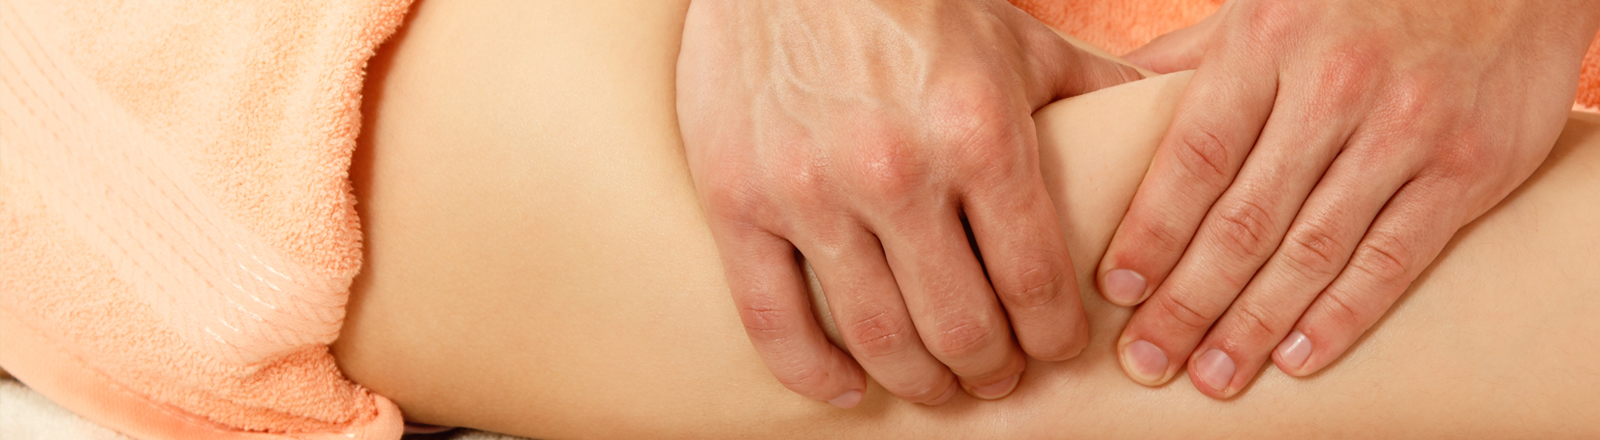 masaje descontracturante Palma